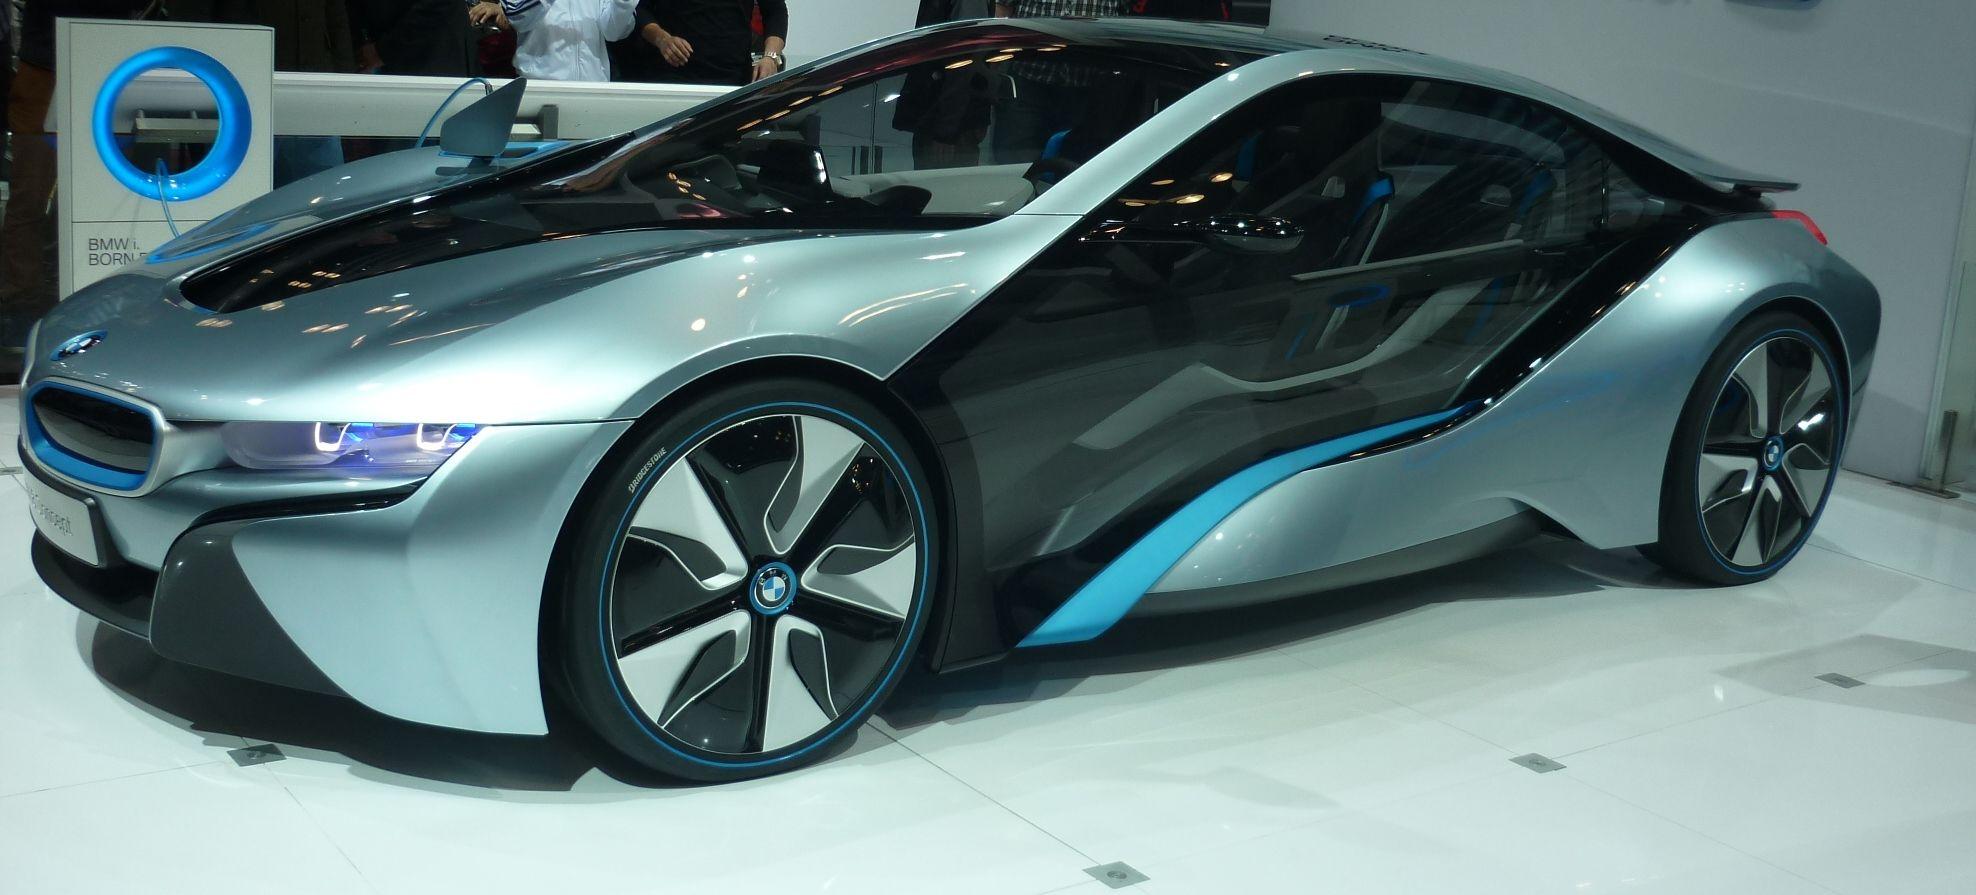 BMW i8 Electric Hotties Bmw i8, Vehicles, Cars